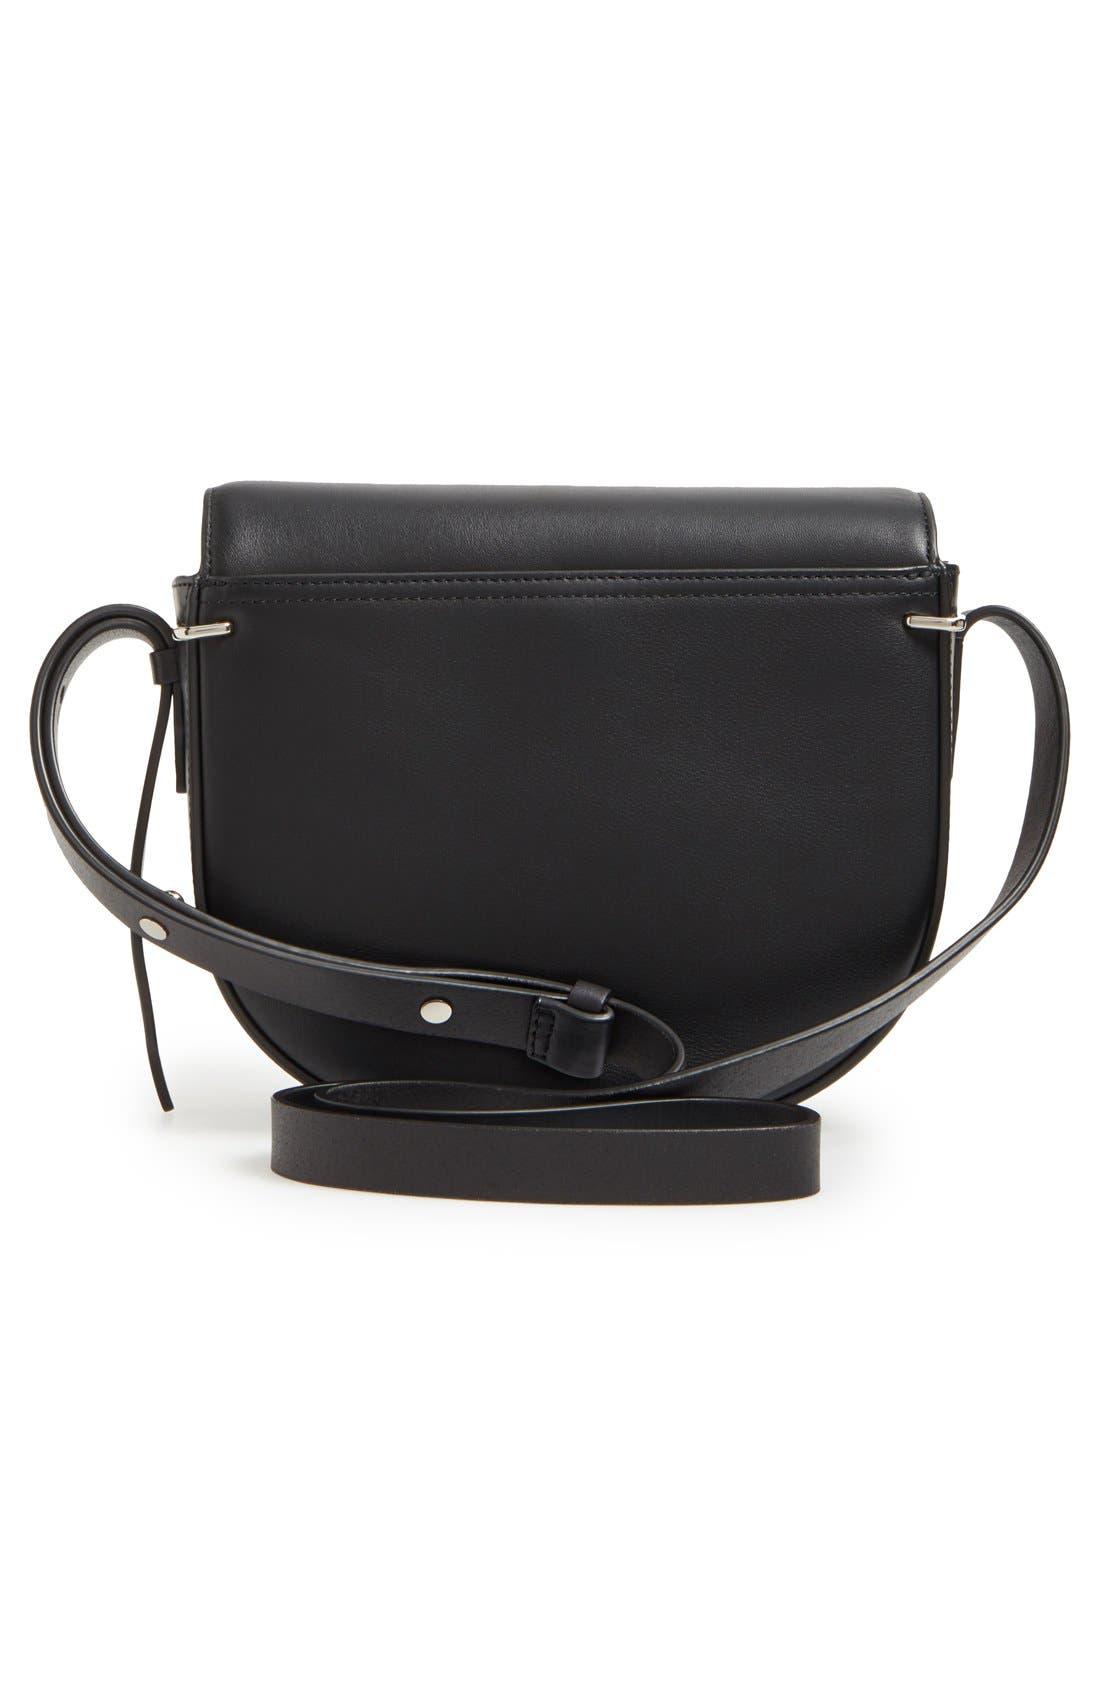 Alix Leather Saddle Bag,                             Alternate thumbnail 3, color,                             001